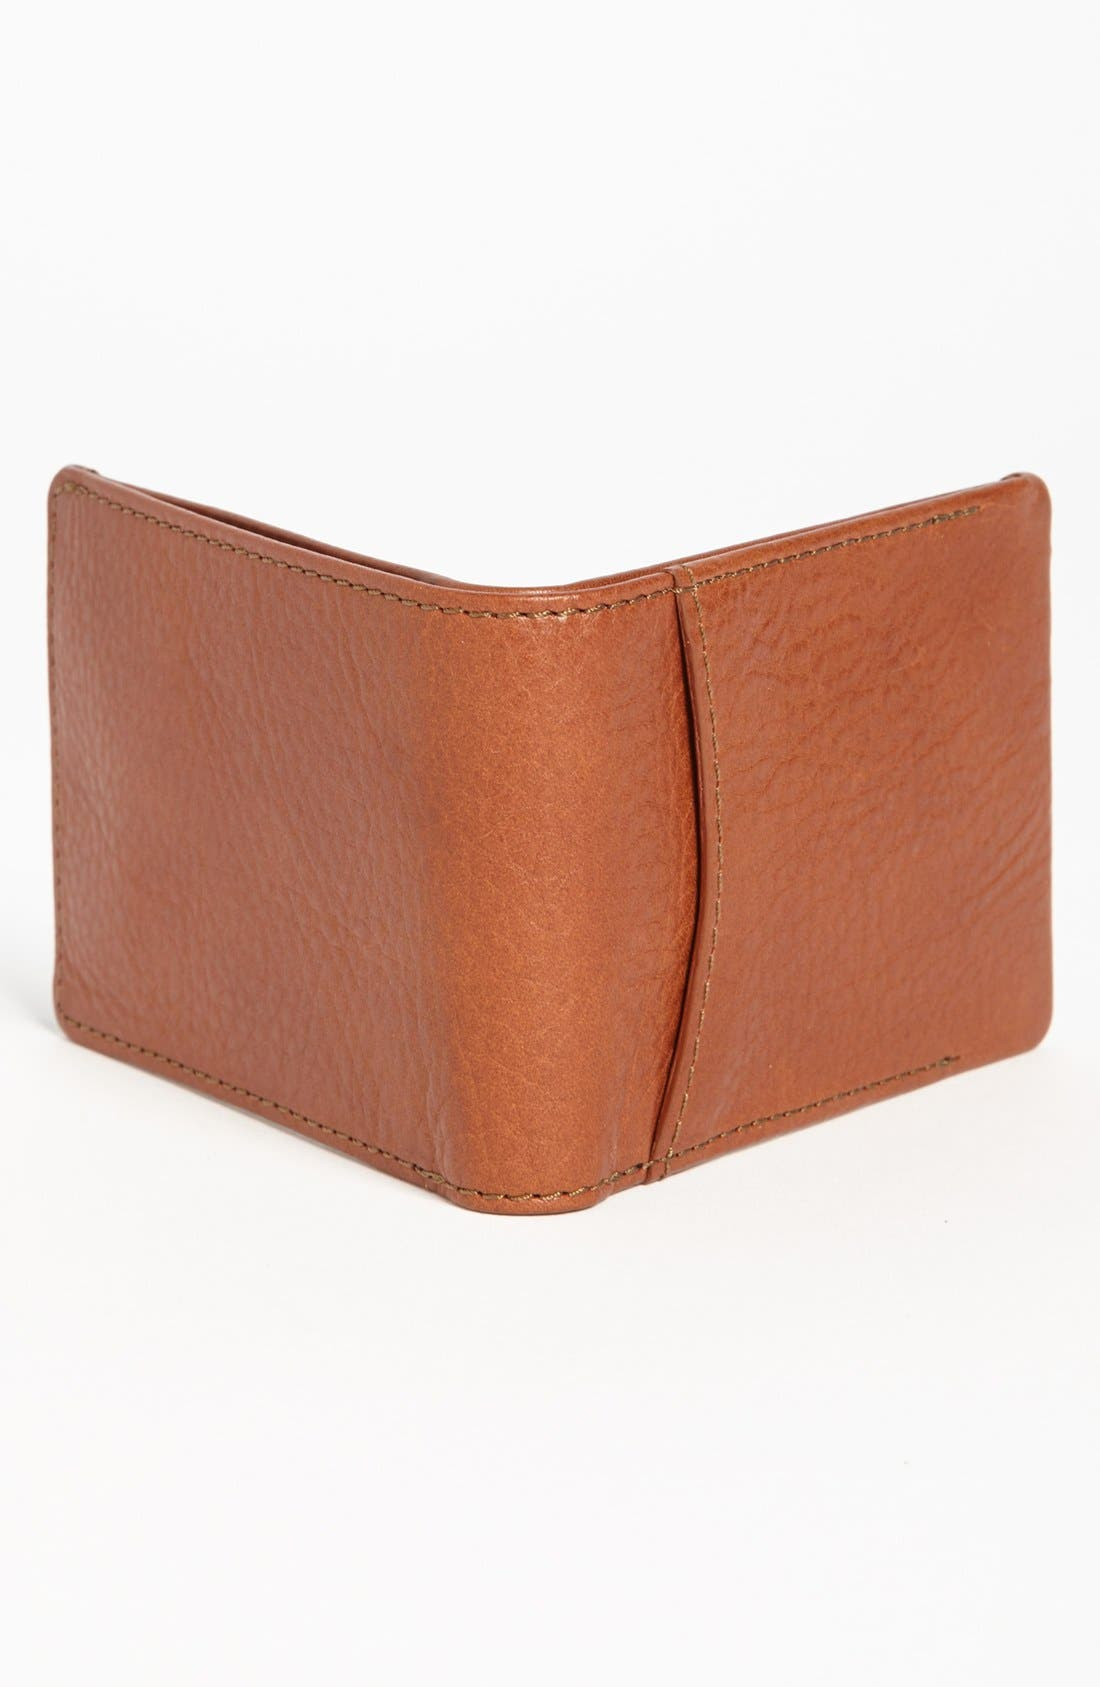 Alternate Image 3  - Bosca Leather Wallet